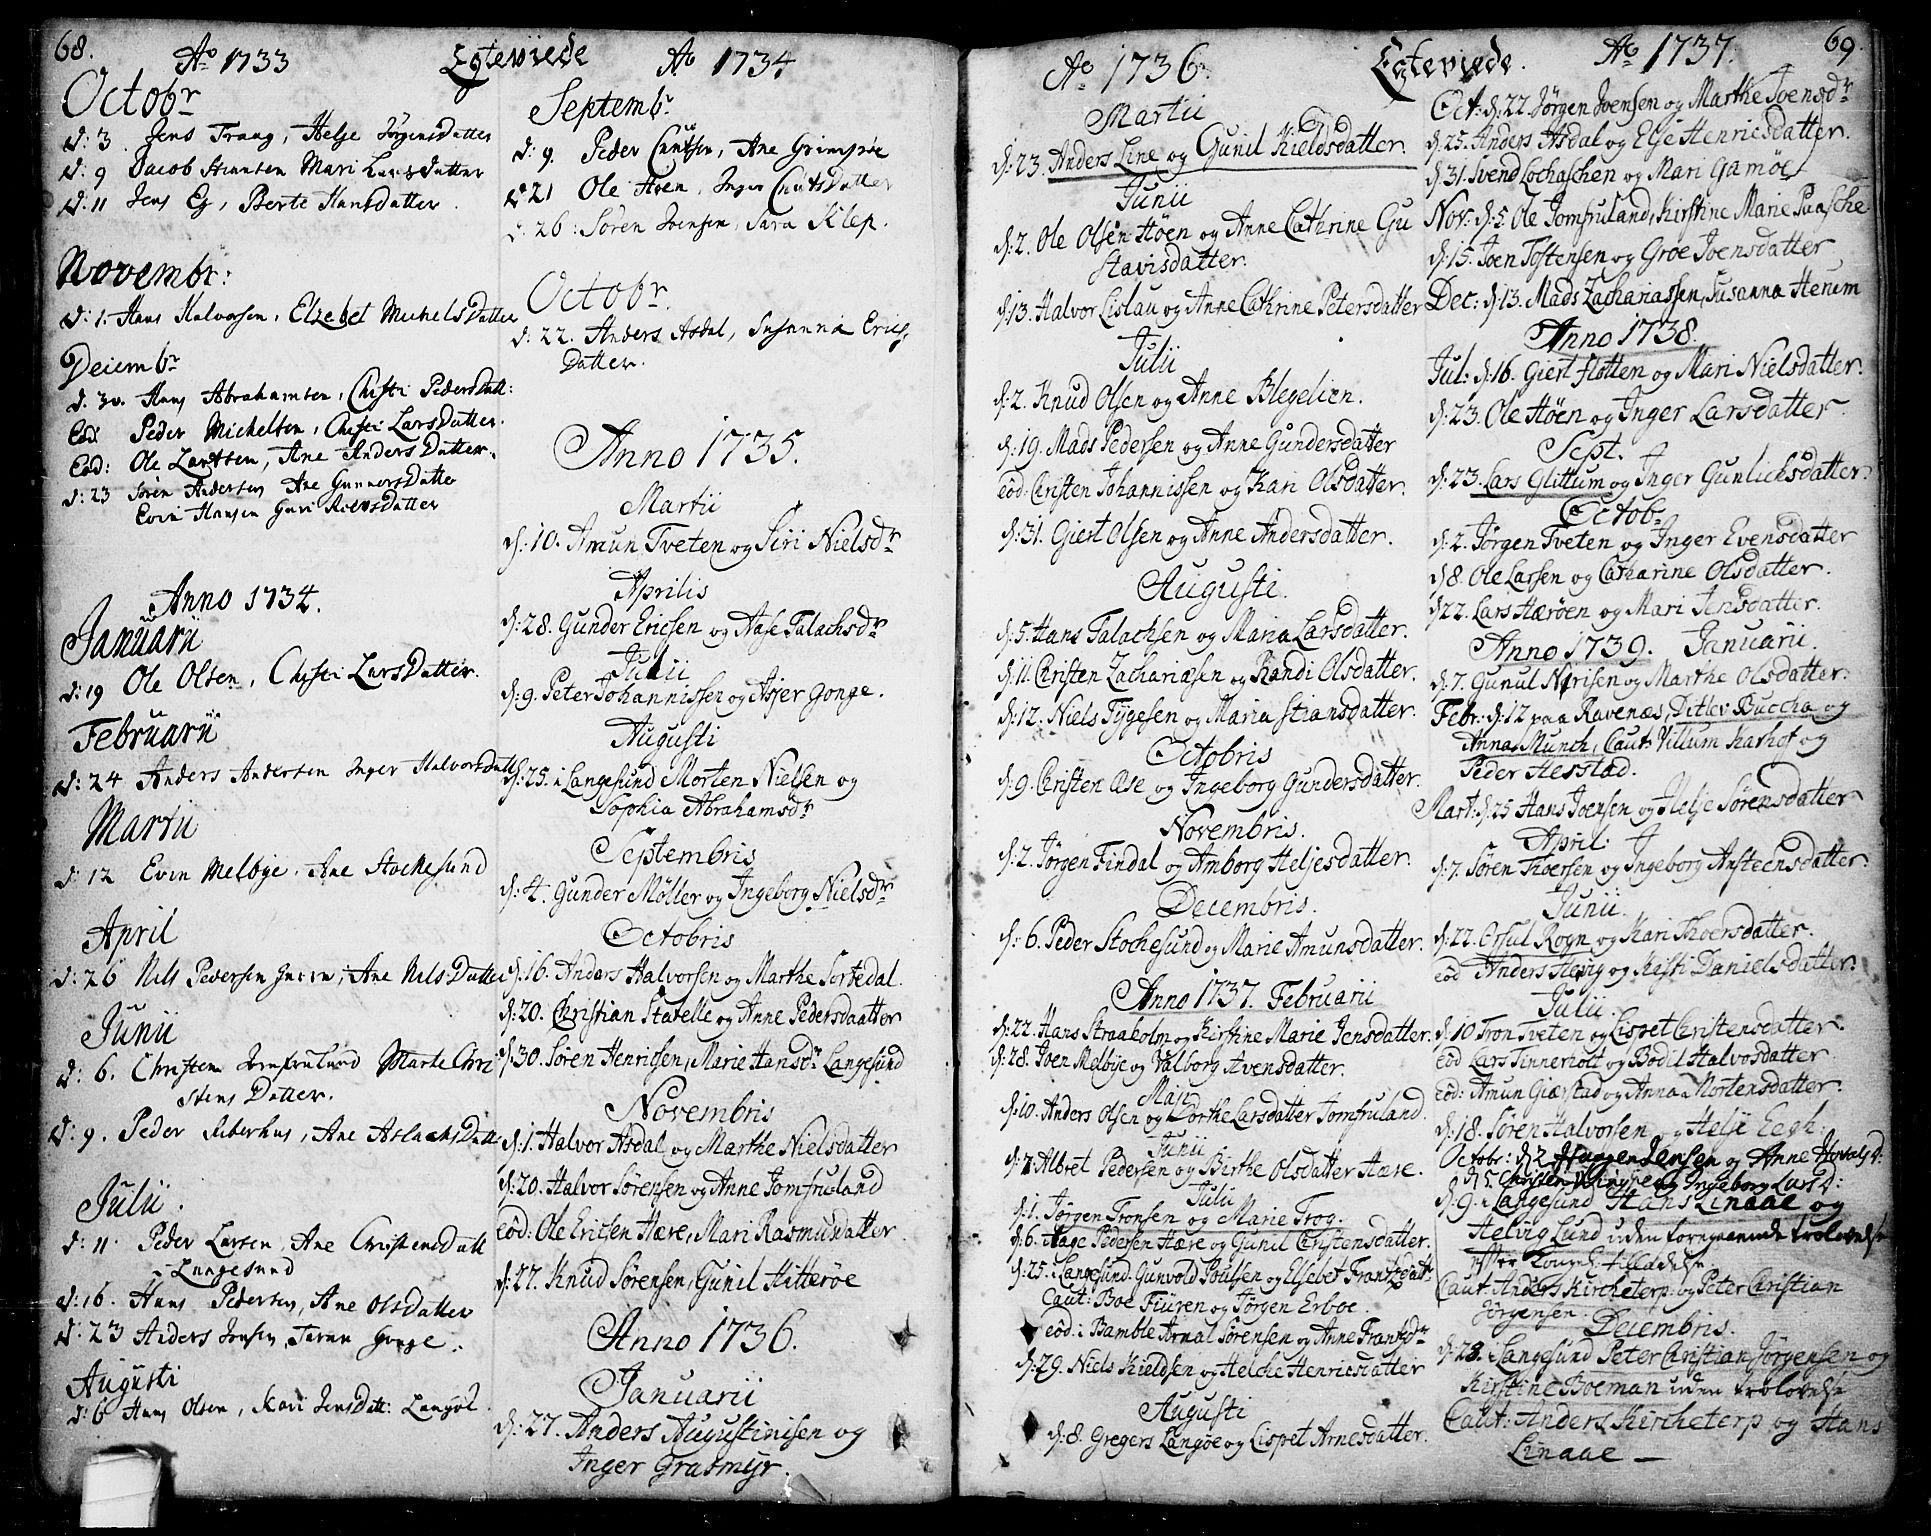 SAKO, Bamble kirkebøker, F/Fa/L0001: Ministerialbok nr. I 1, 1702-1774, s. 68-69